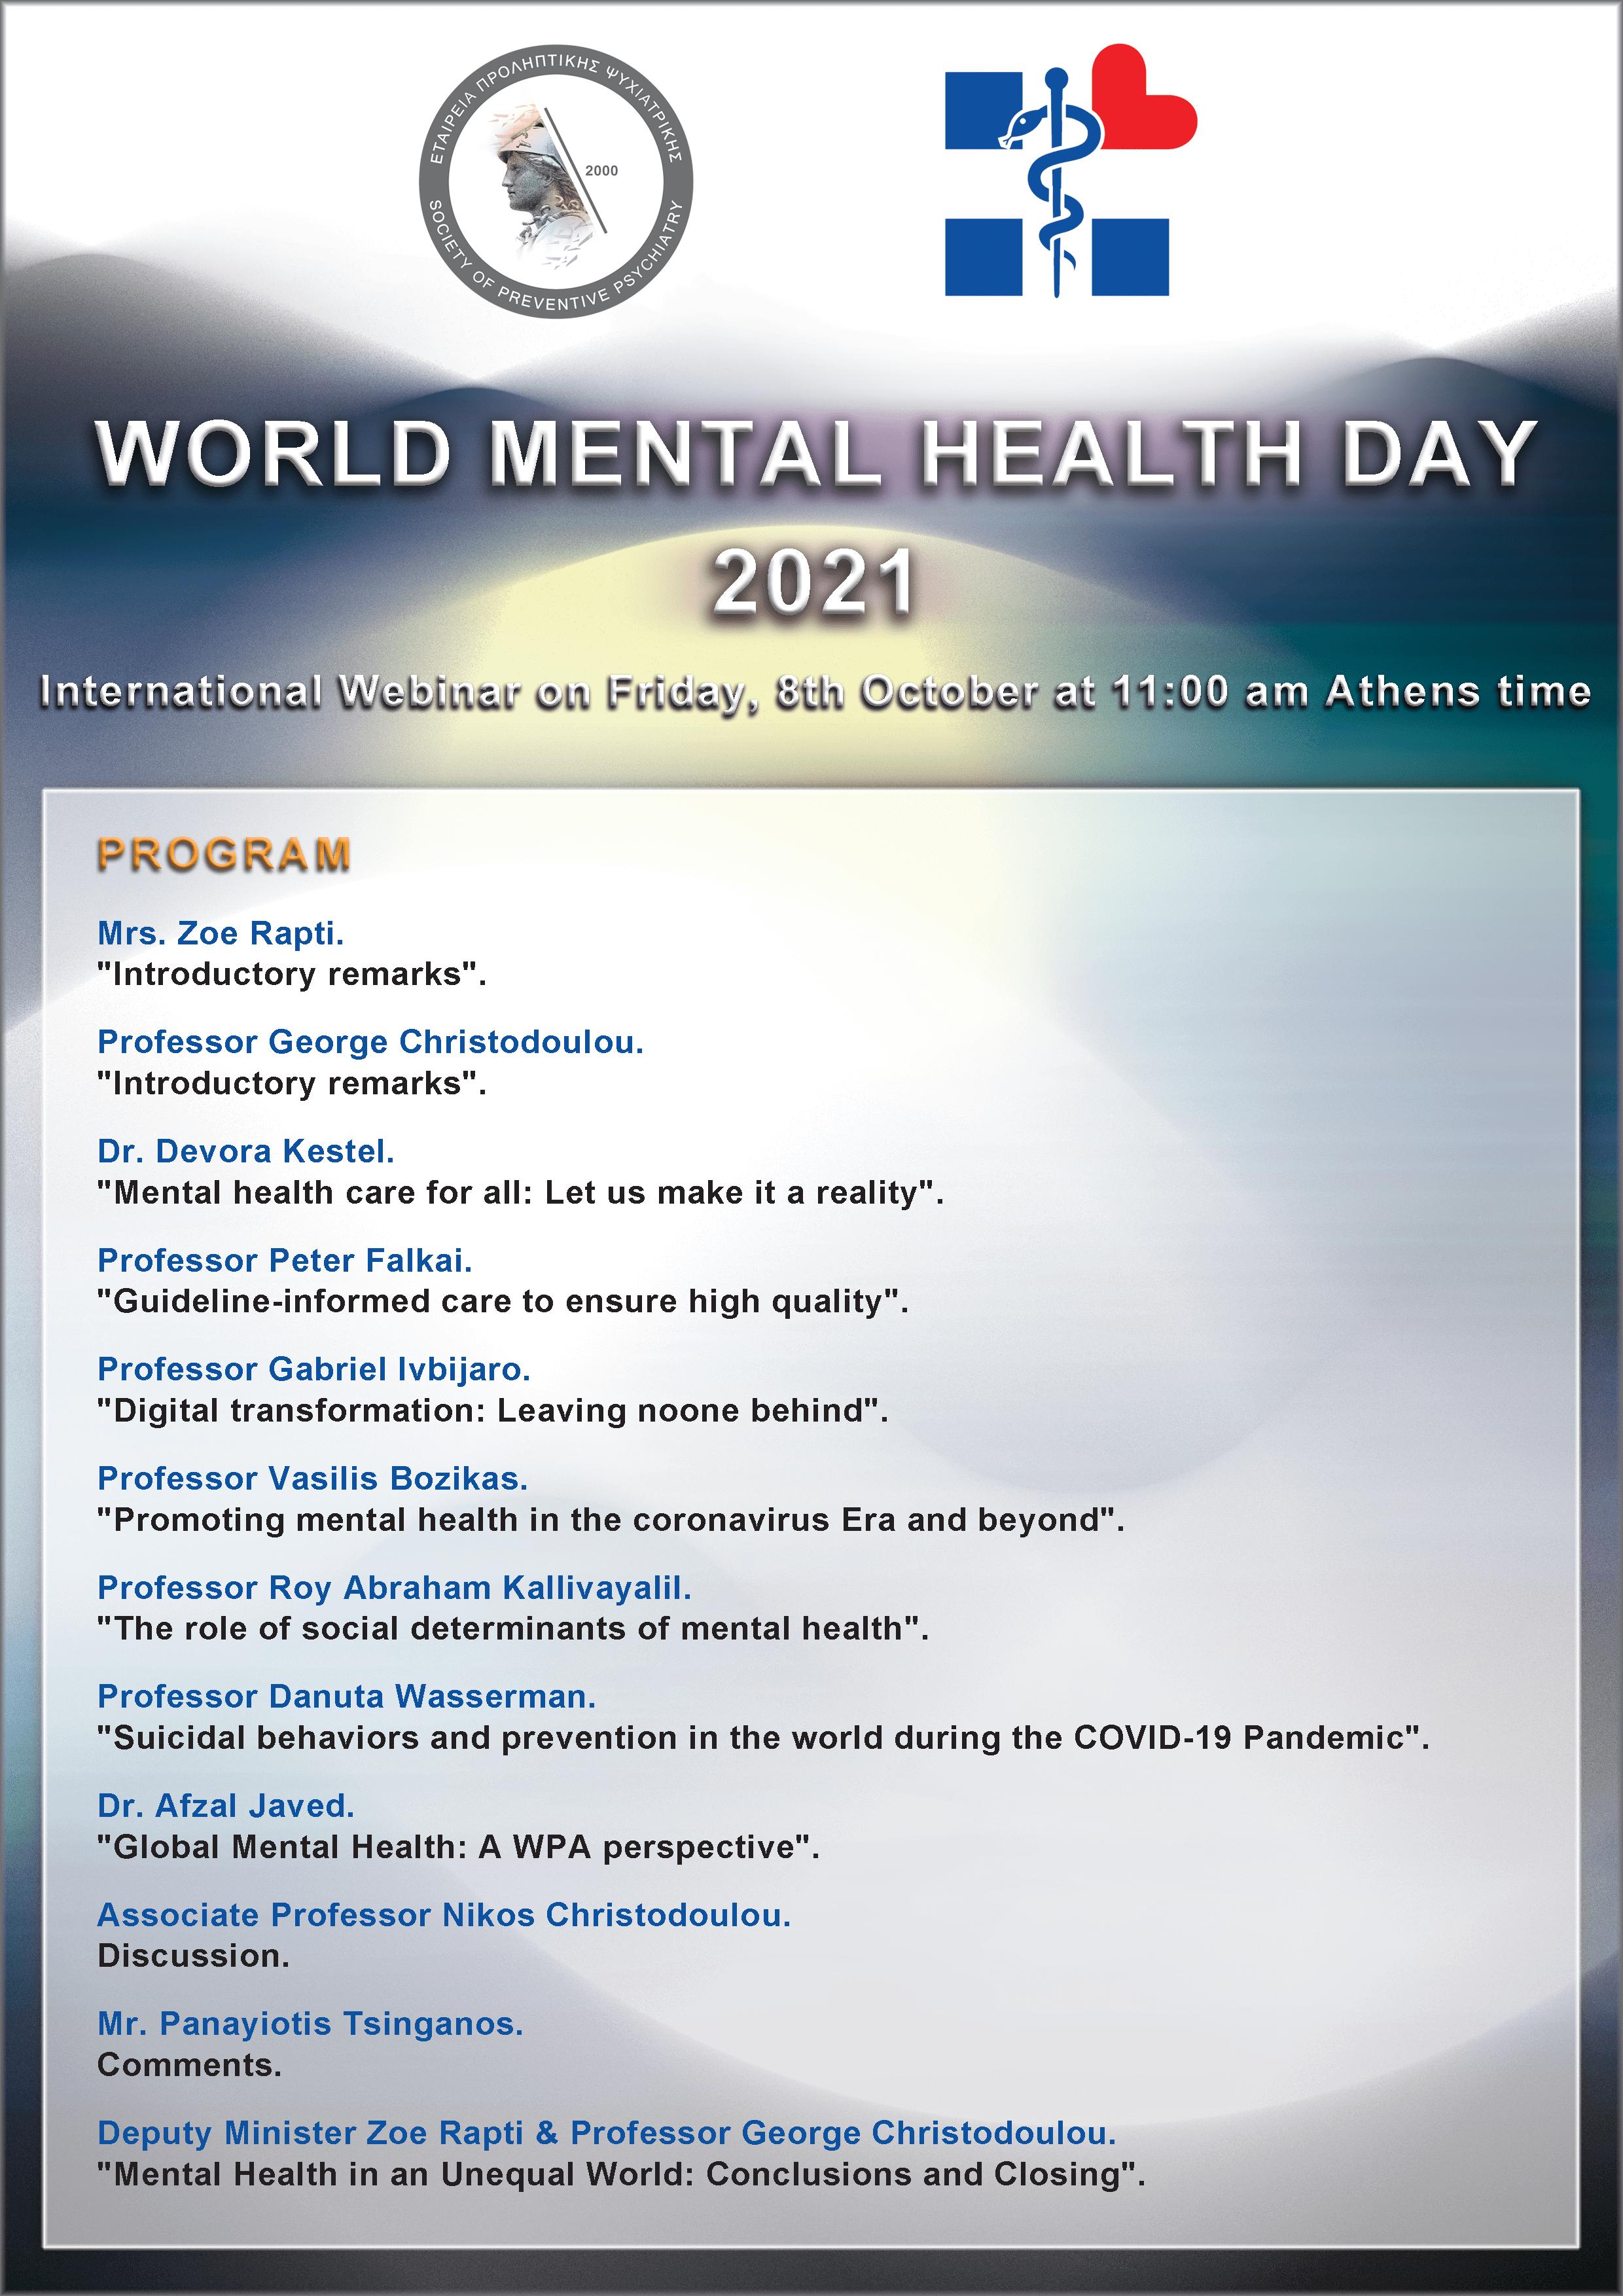 WORLD MENTAL HEALTH DAY 2021 - Program.